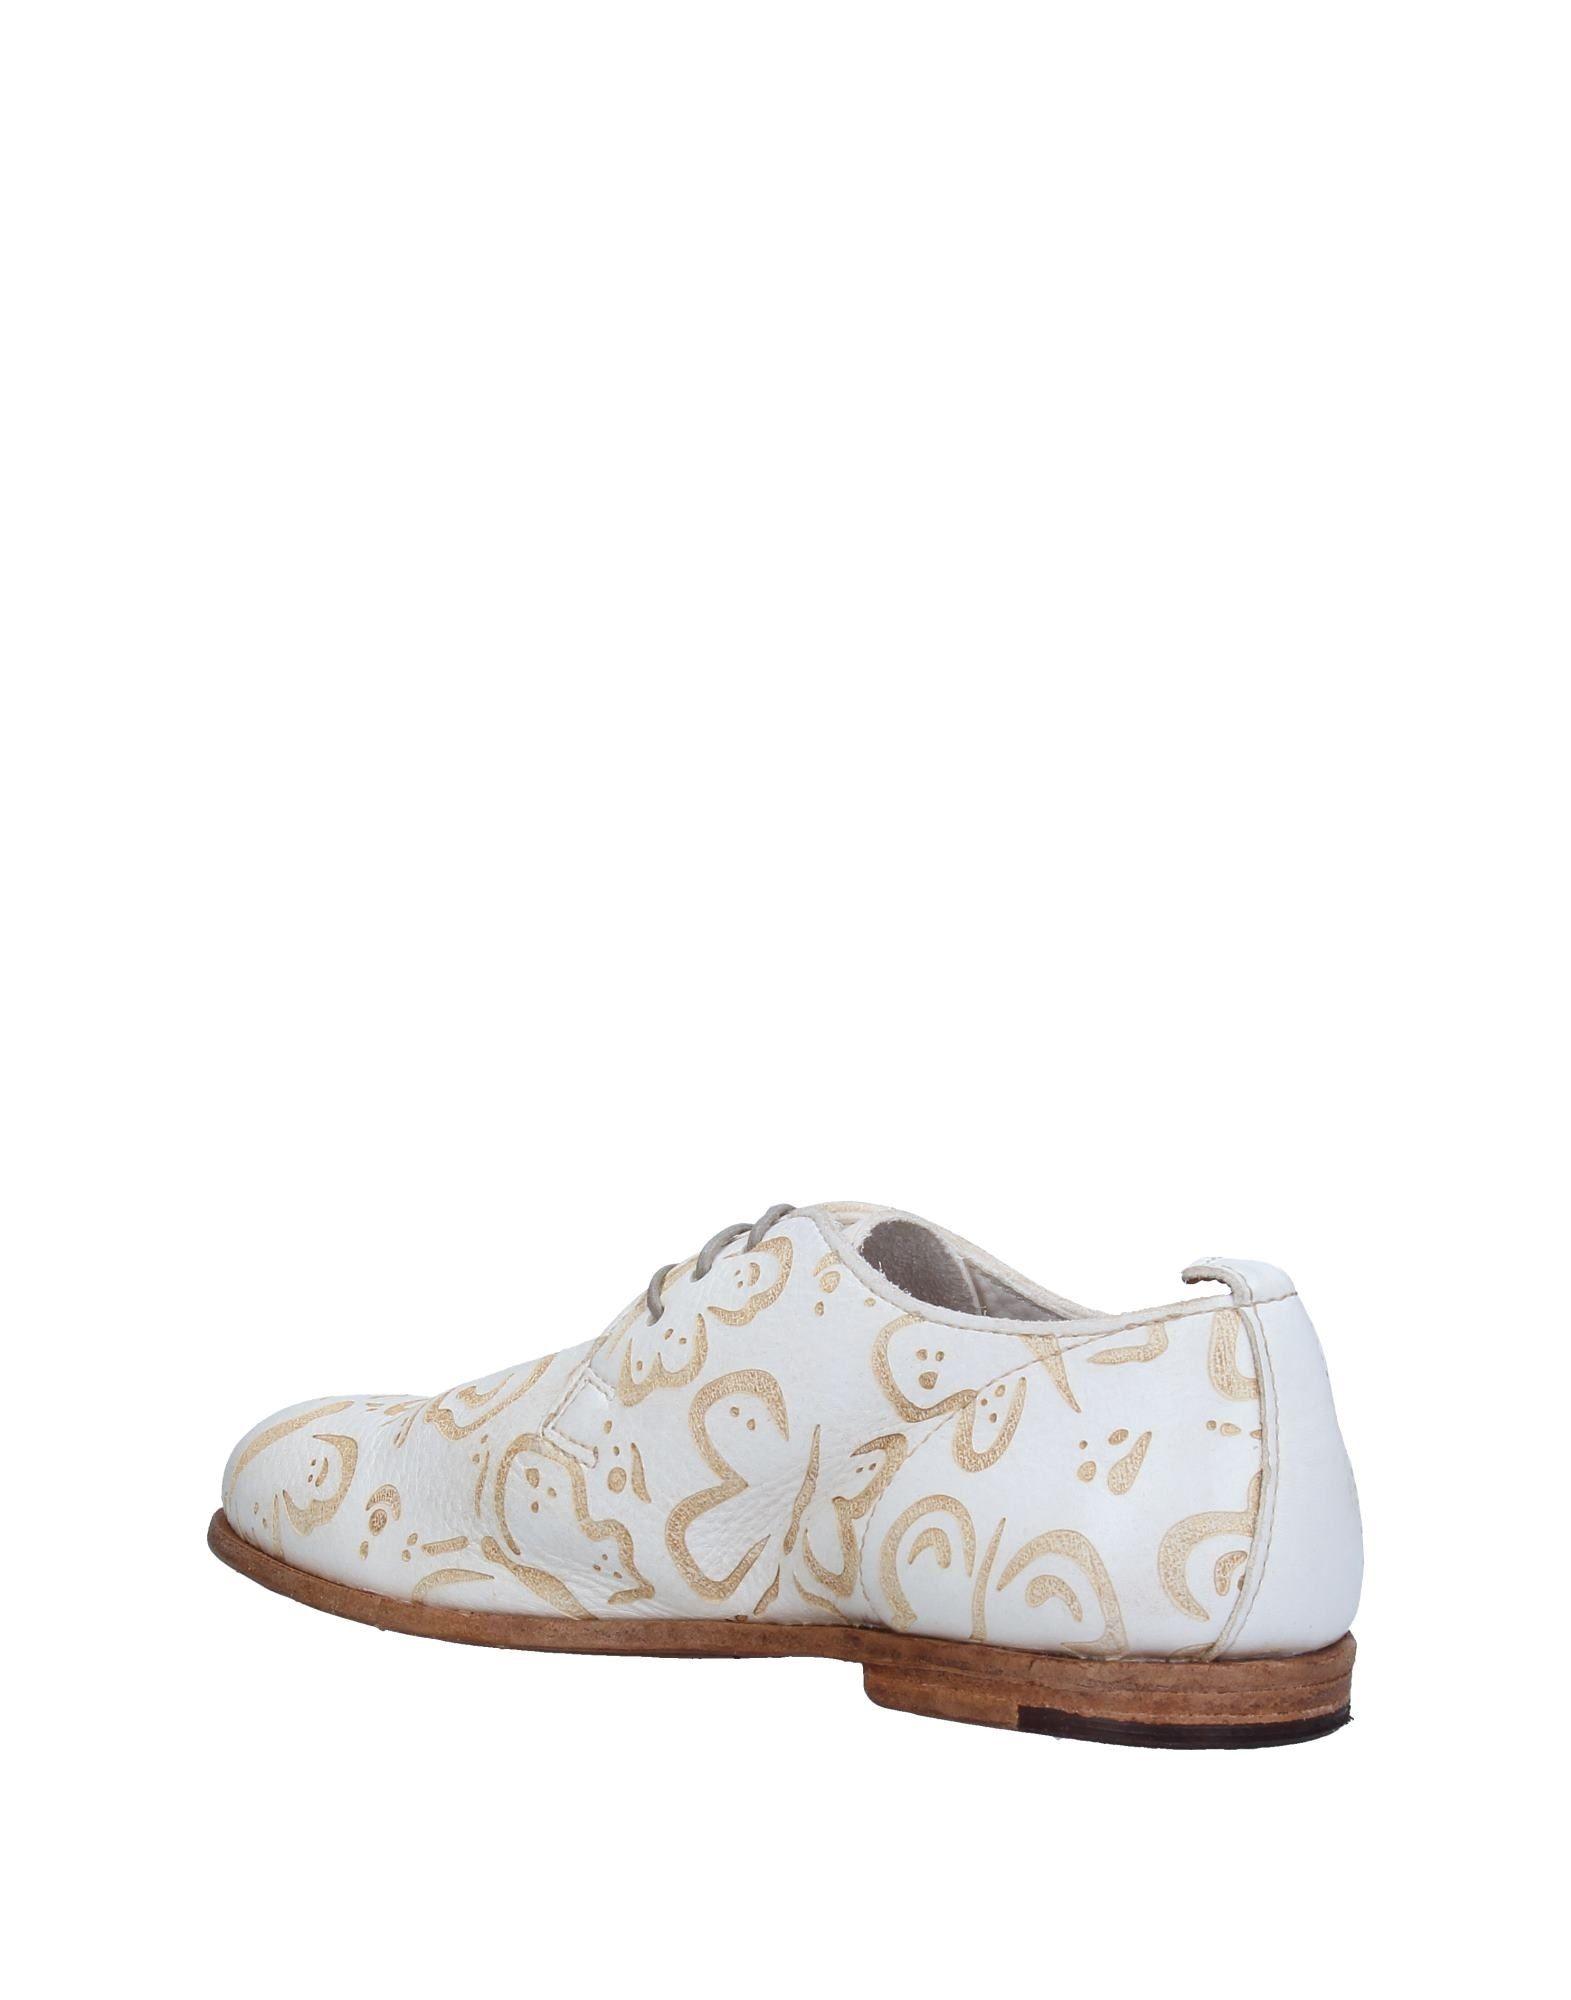 Moma Schnürschuhe Damen  Schuhe 11326269HD Heiße Schuhe  3b4668